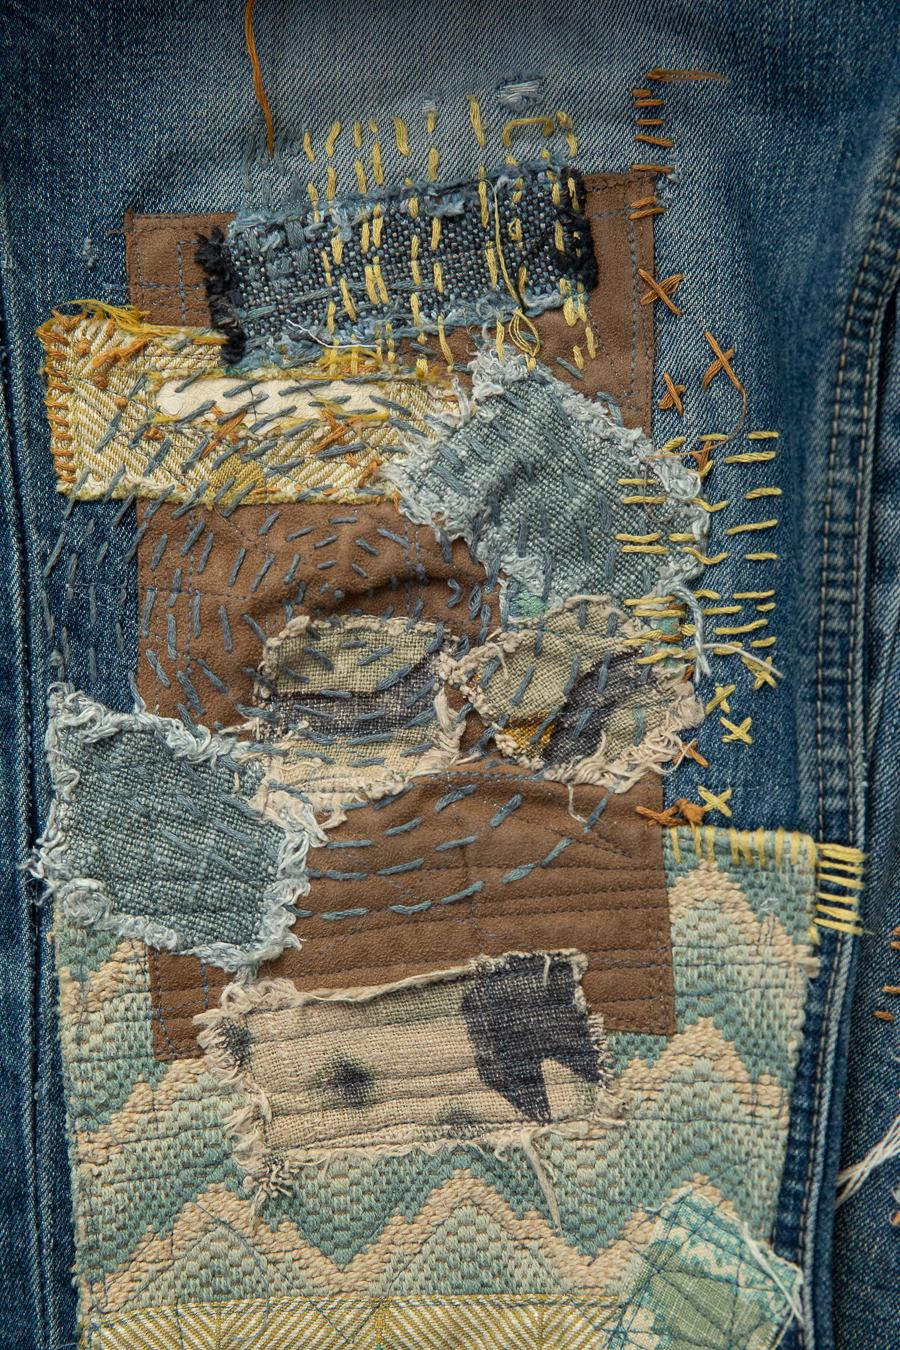 make-art-life-blog-patches-2